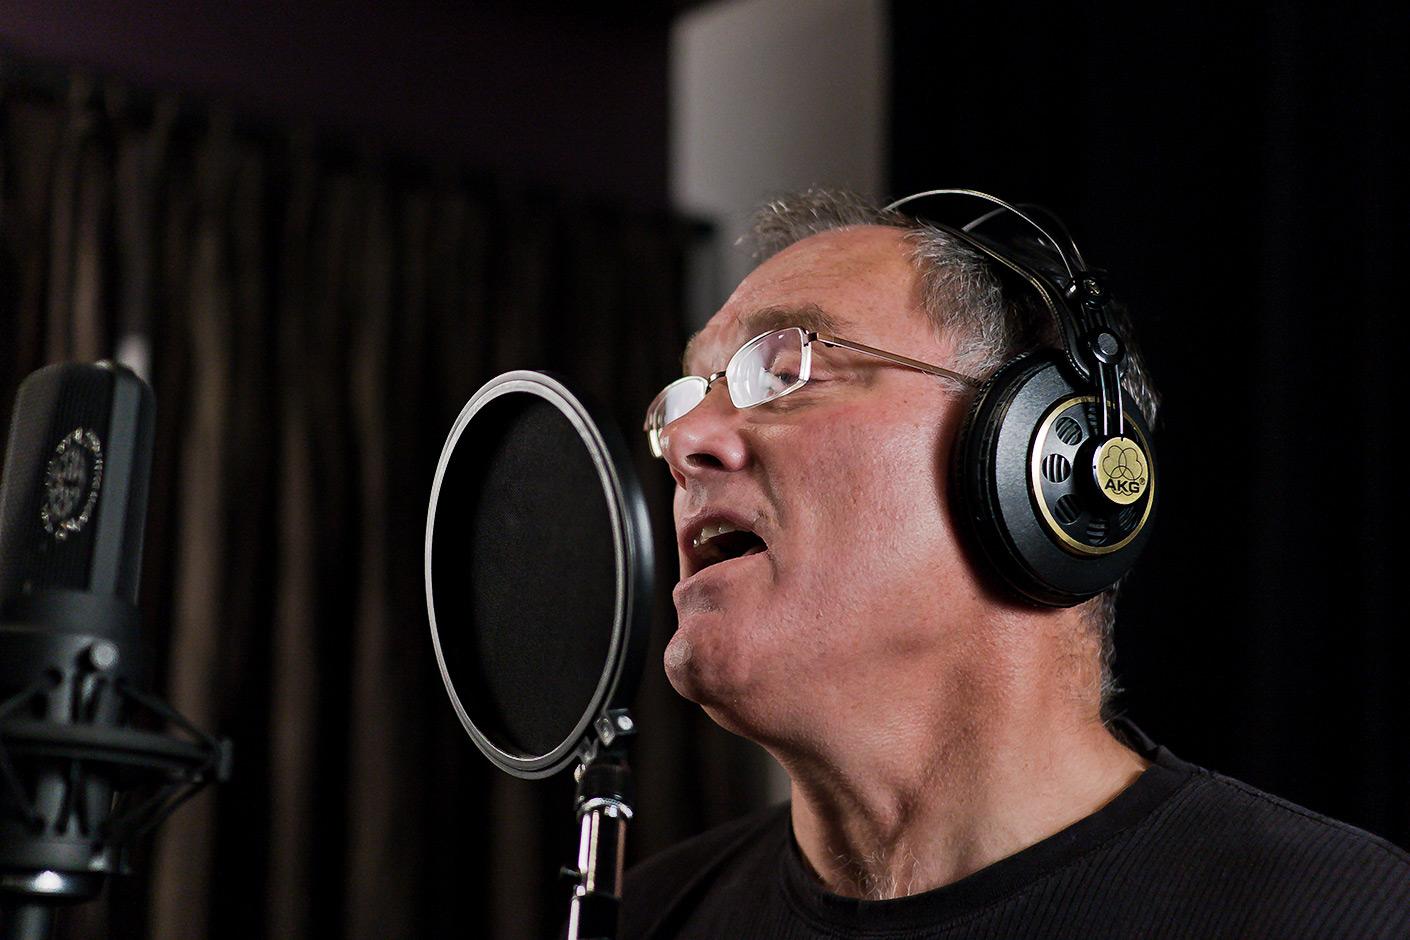 Larry Murante recording at DBAR Productions